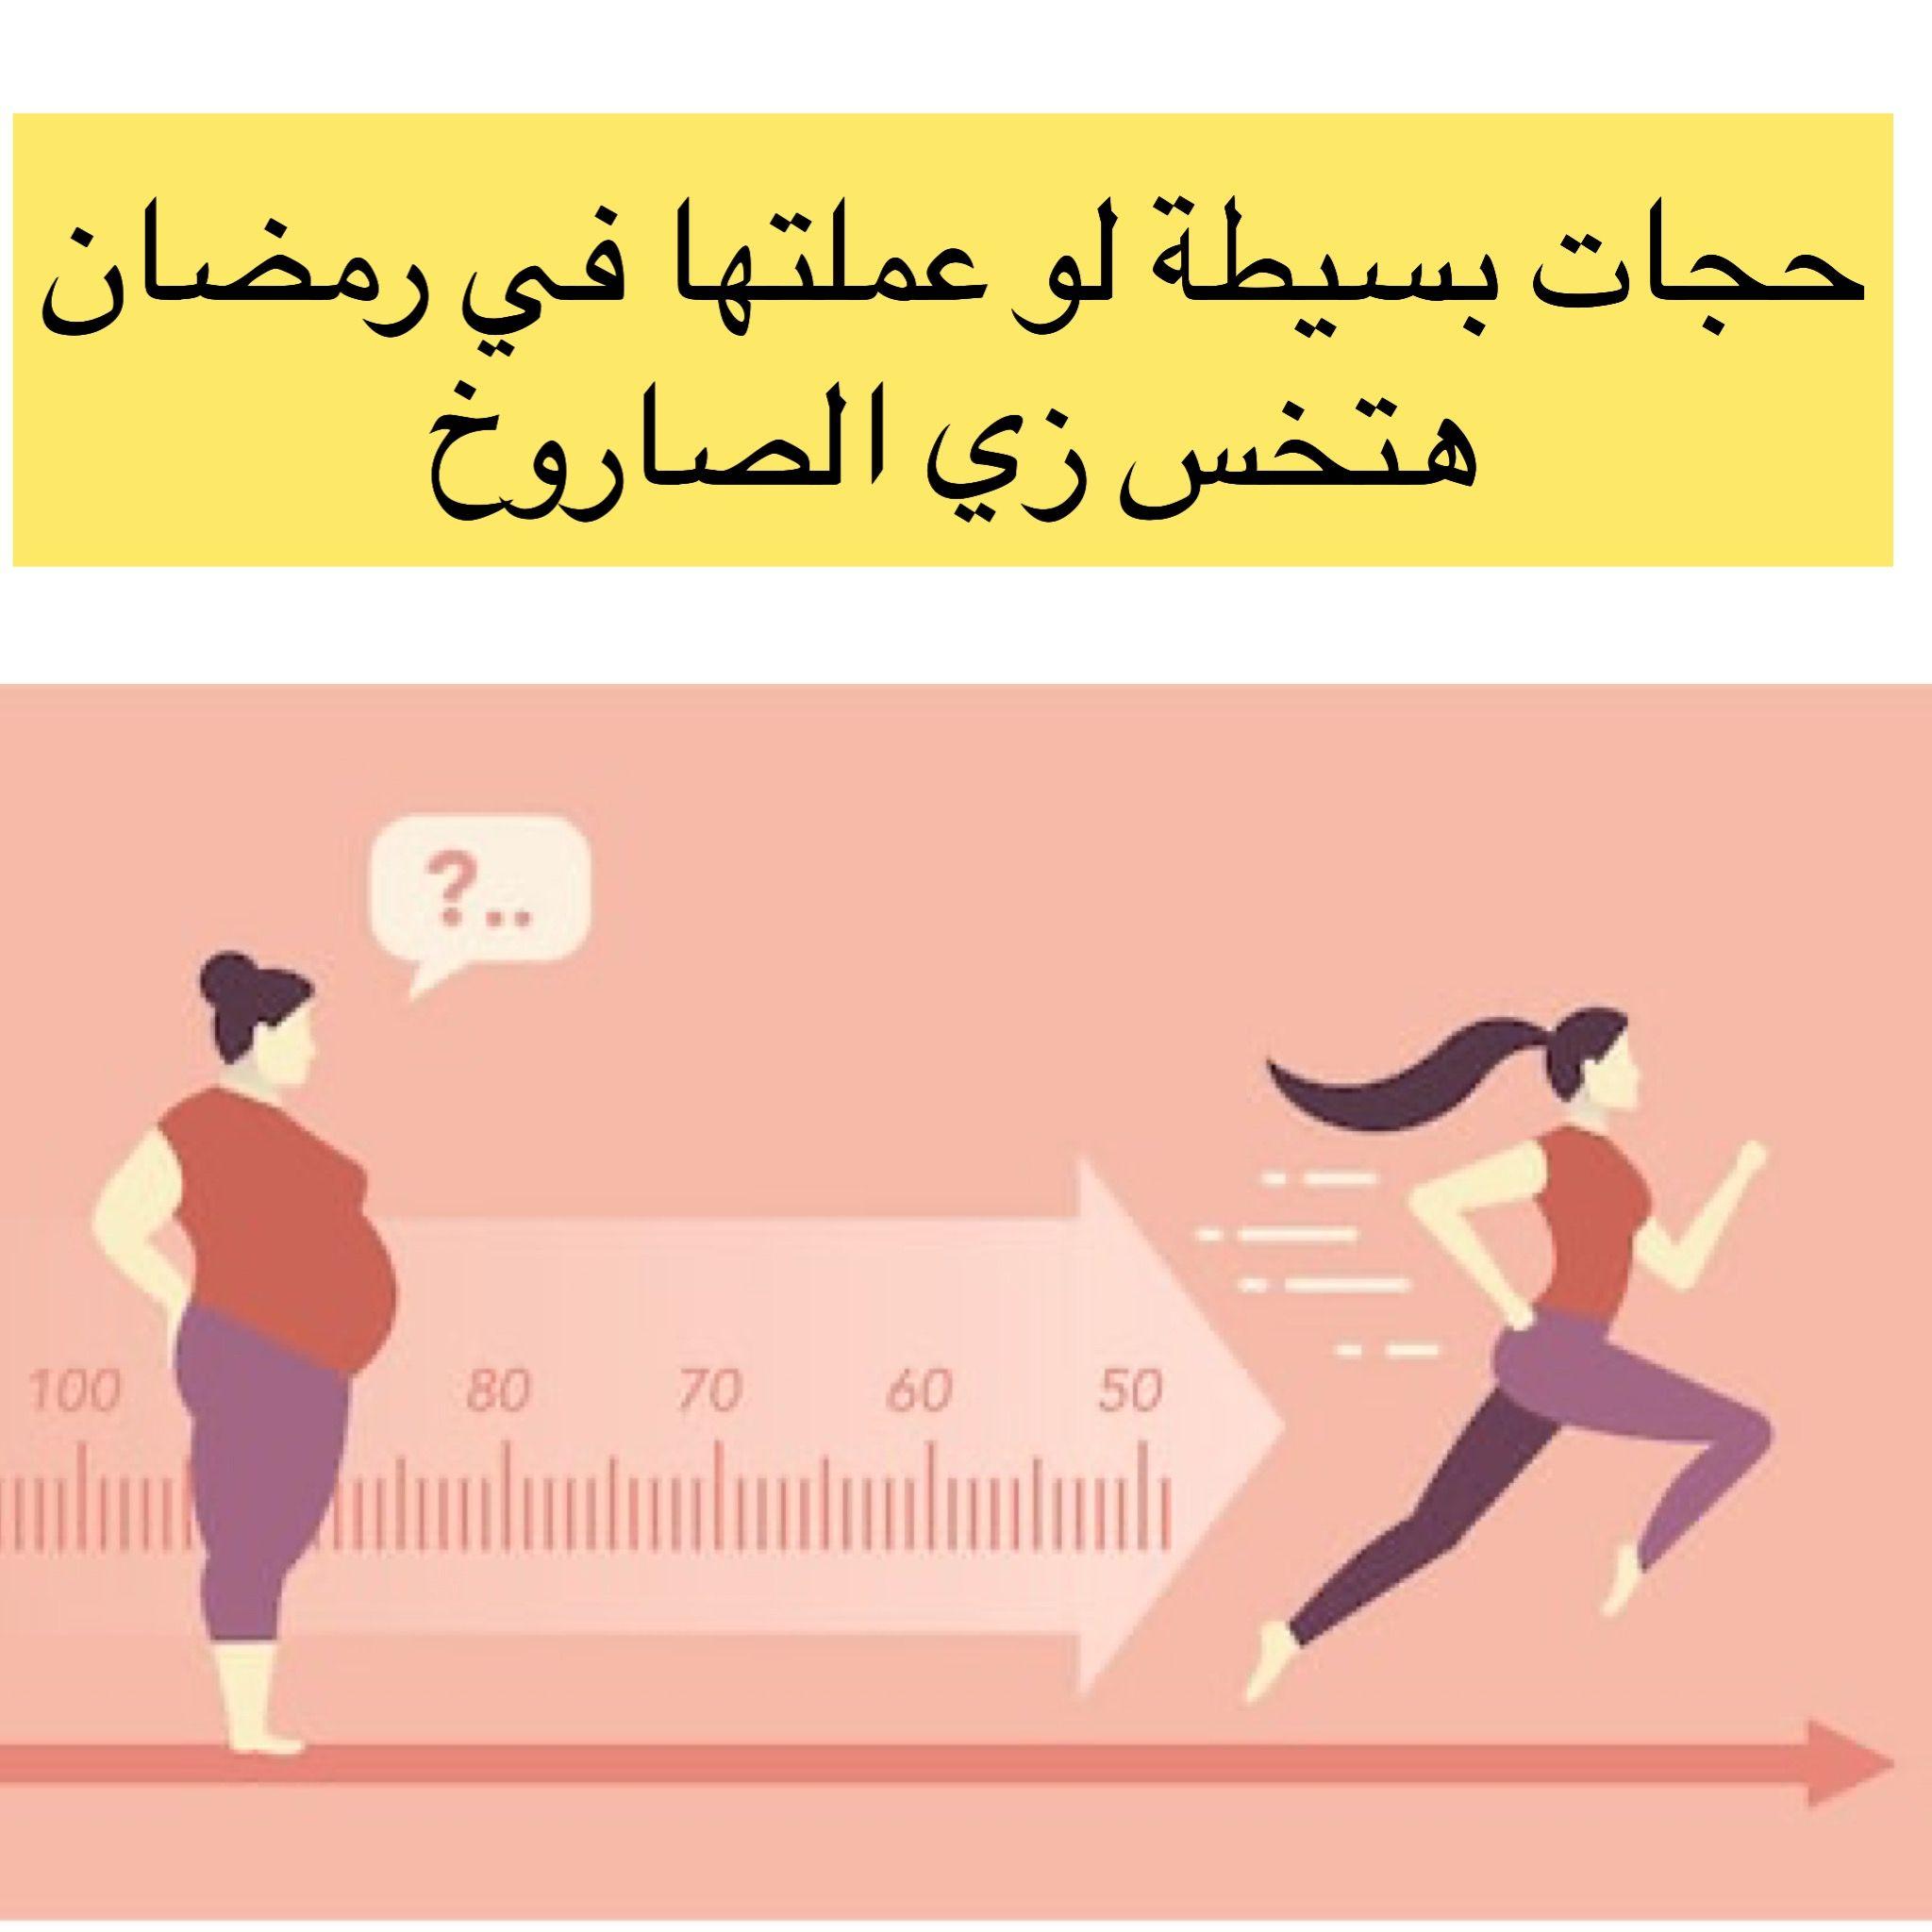 اهم نصائح انقاص الوزن في رمضان بدون حرمان مهم جدا رمضان Youtube Ramadan Positivity Health